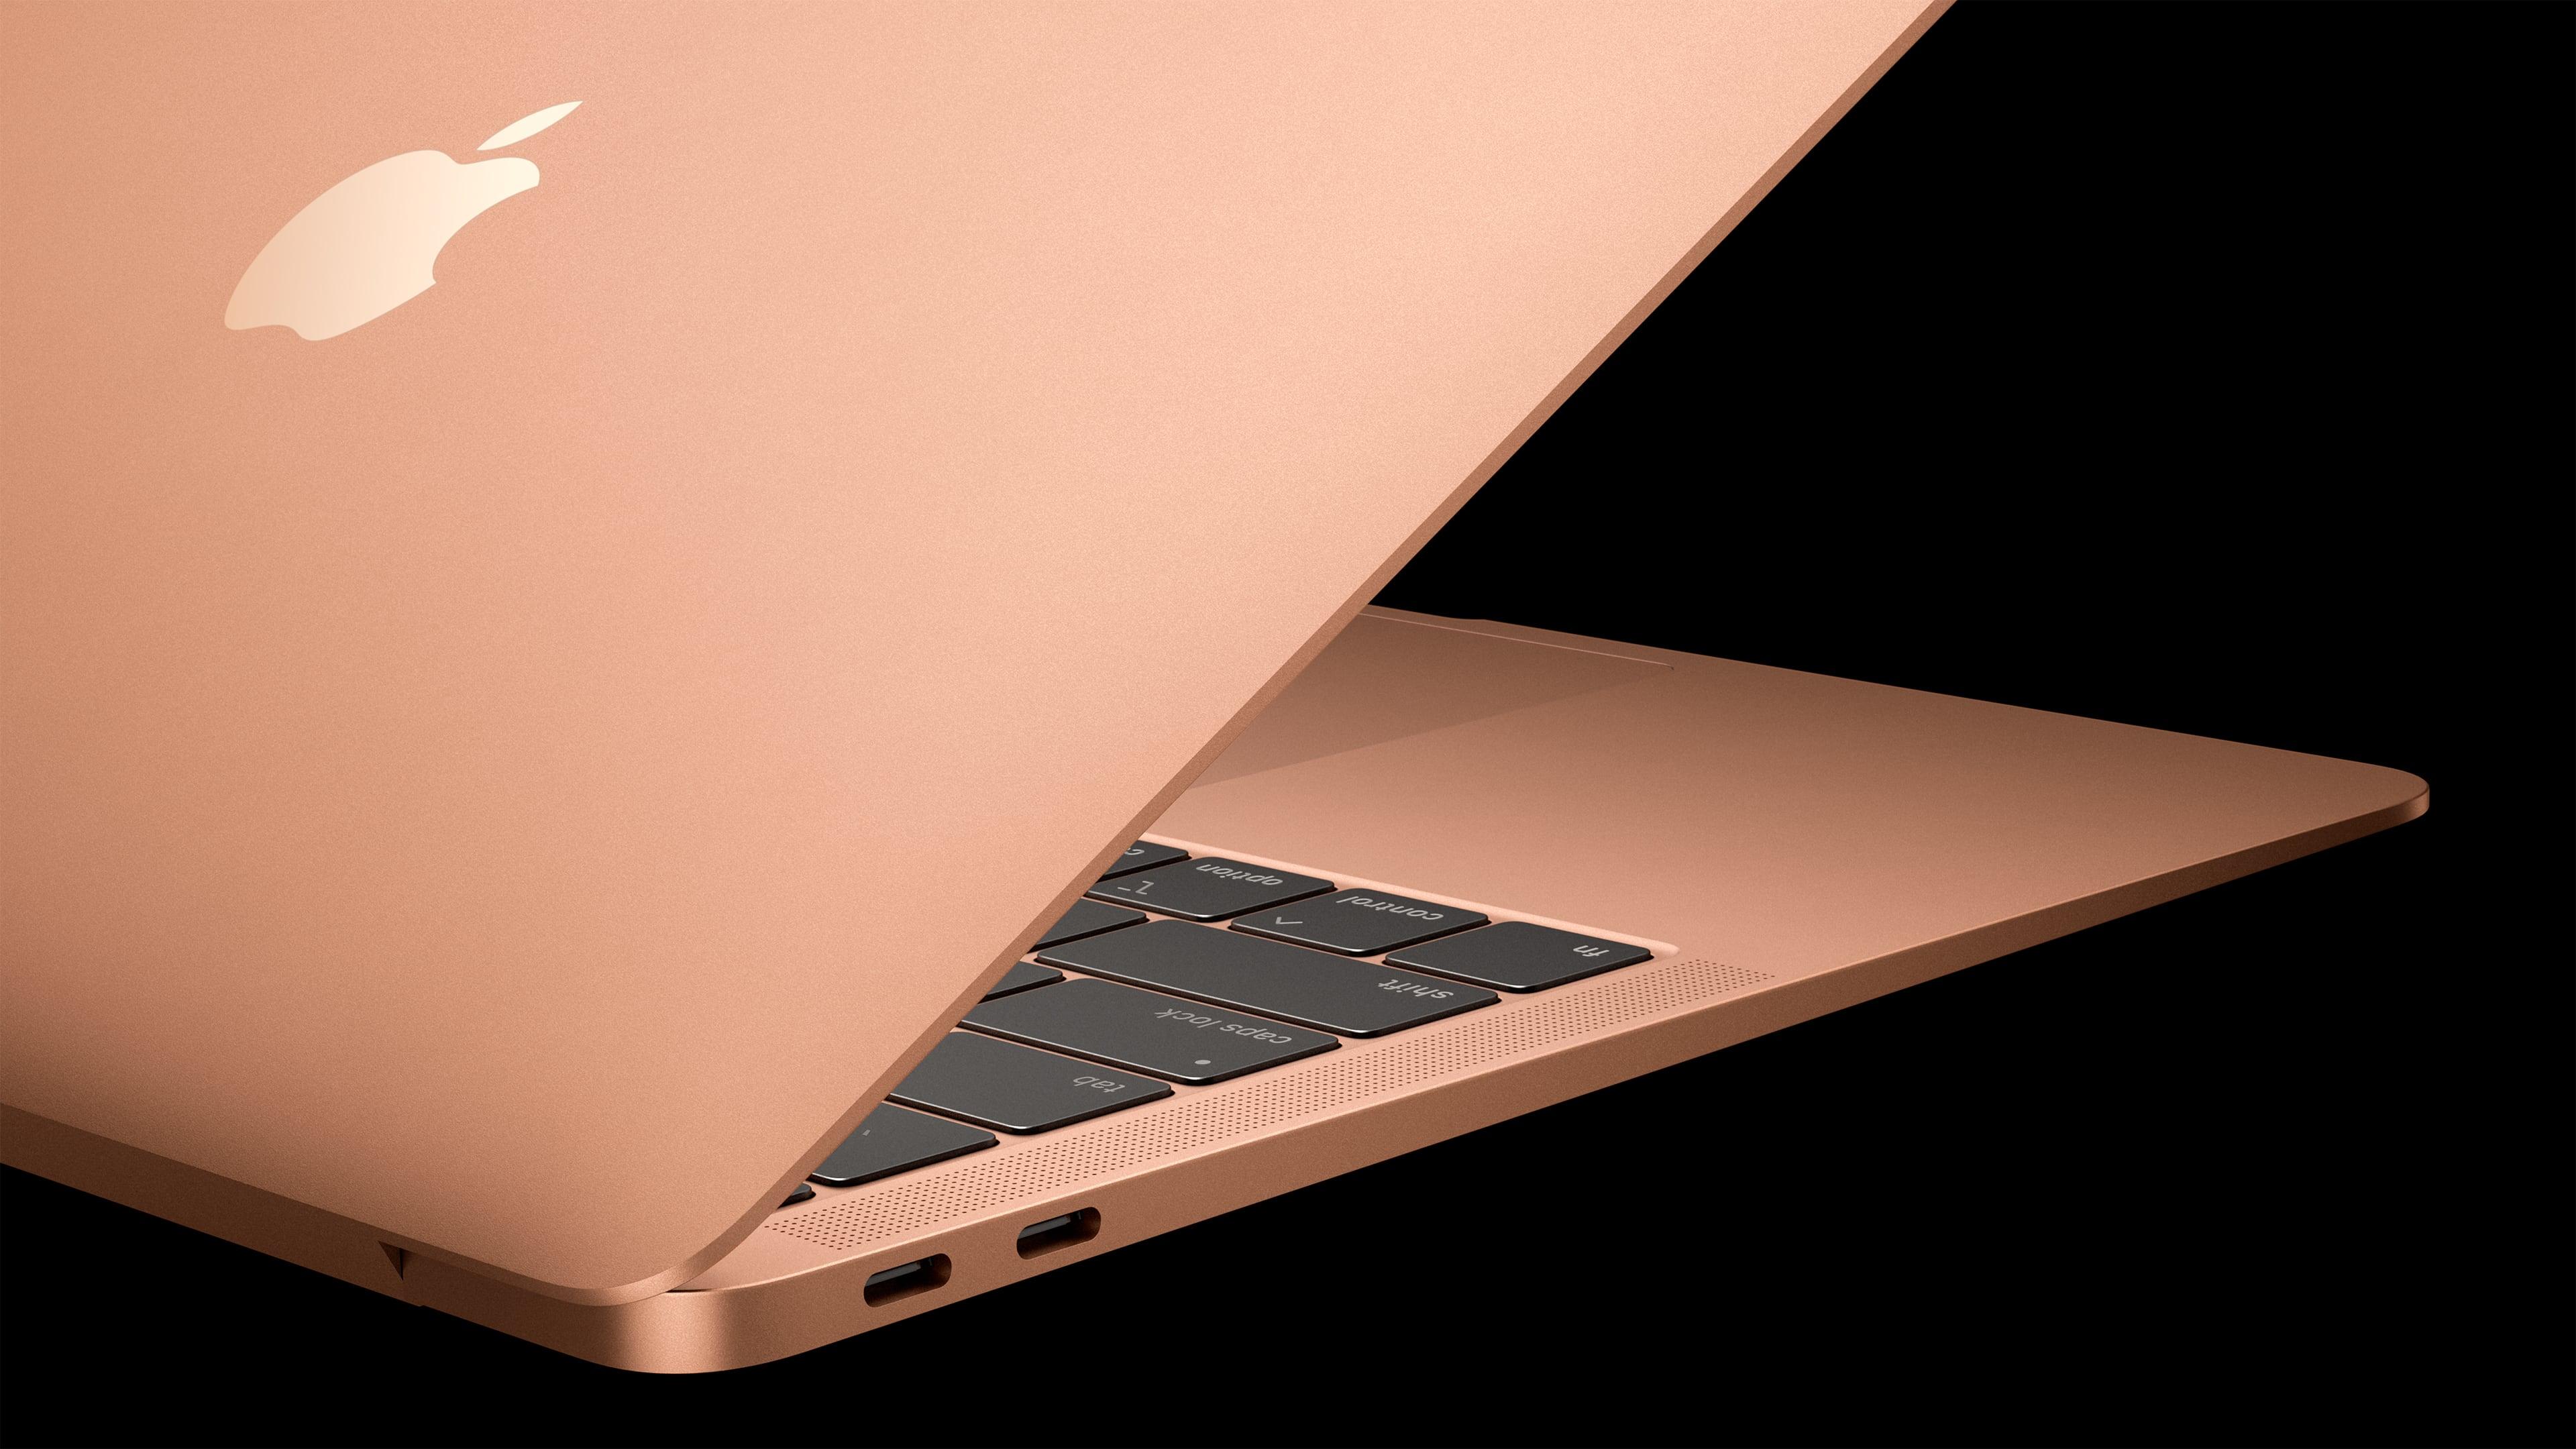 MacBook Air keyboard and ports